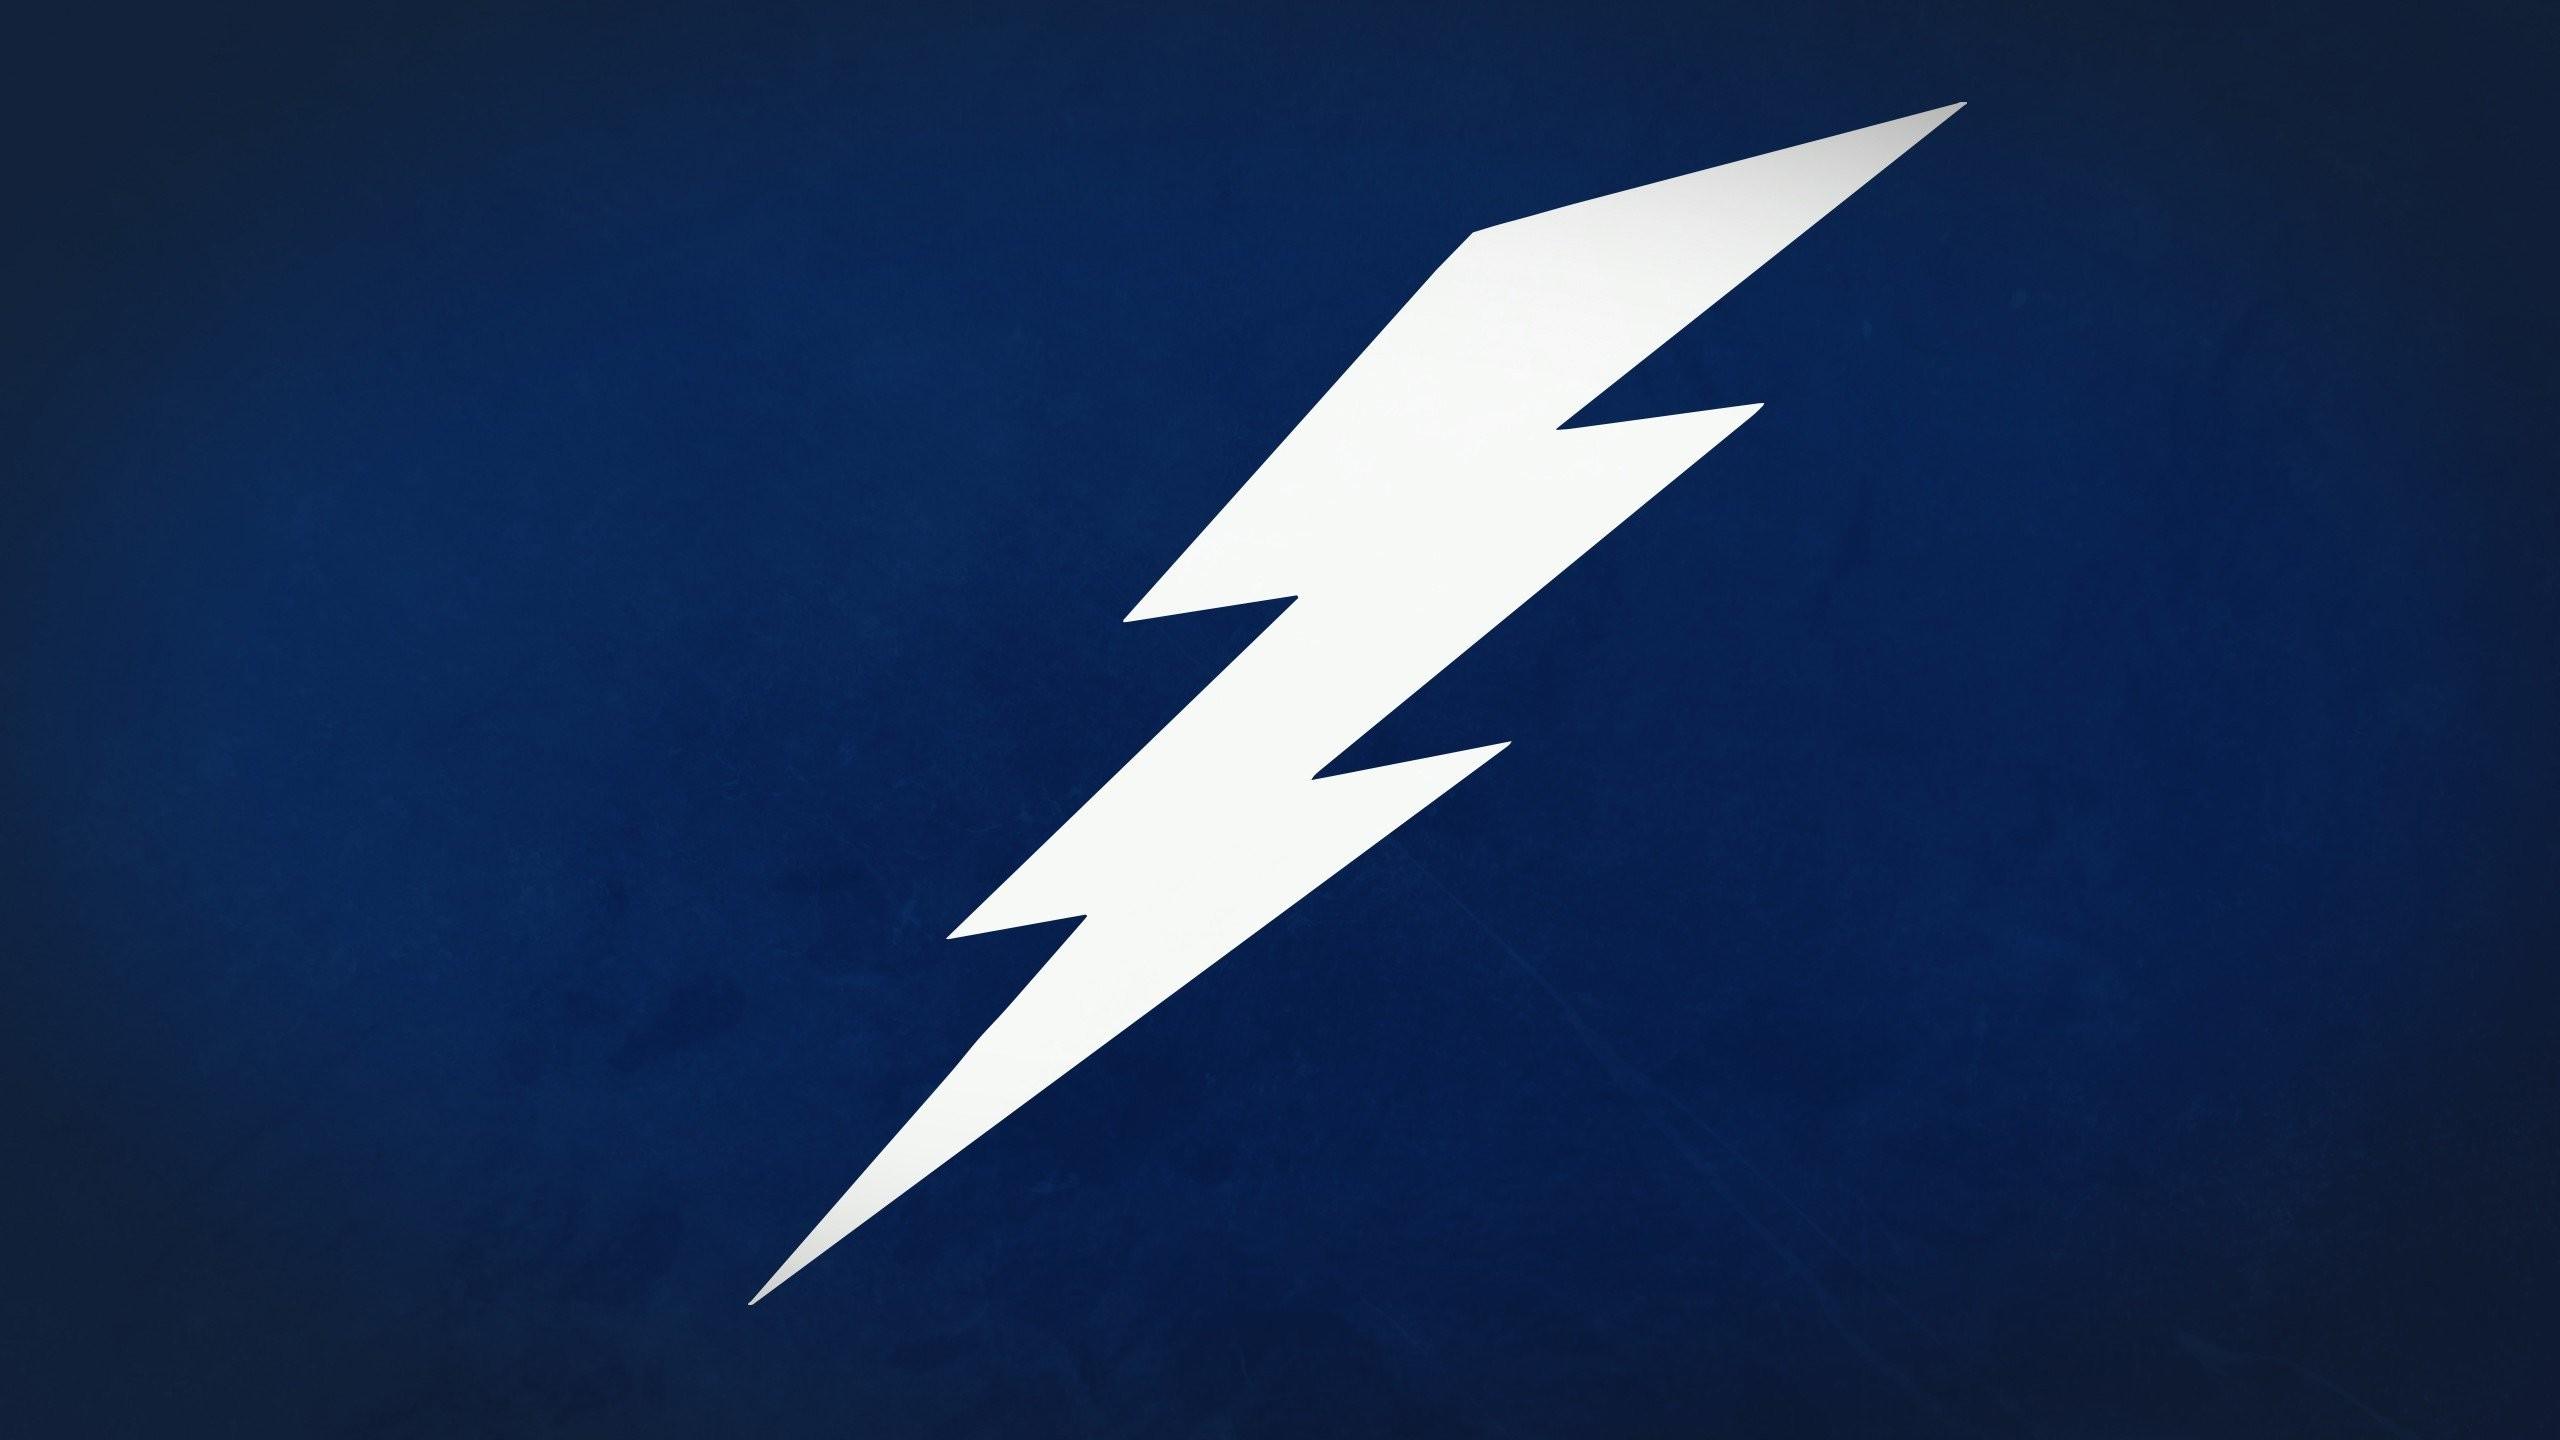 Lightning Bolt Wallpaper (45+ pictures)